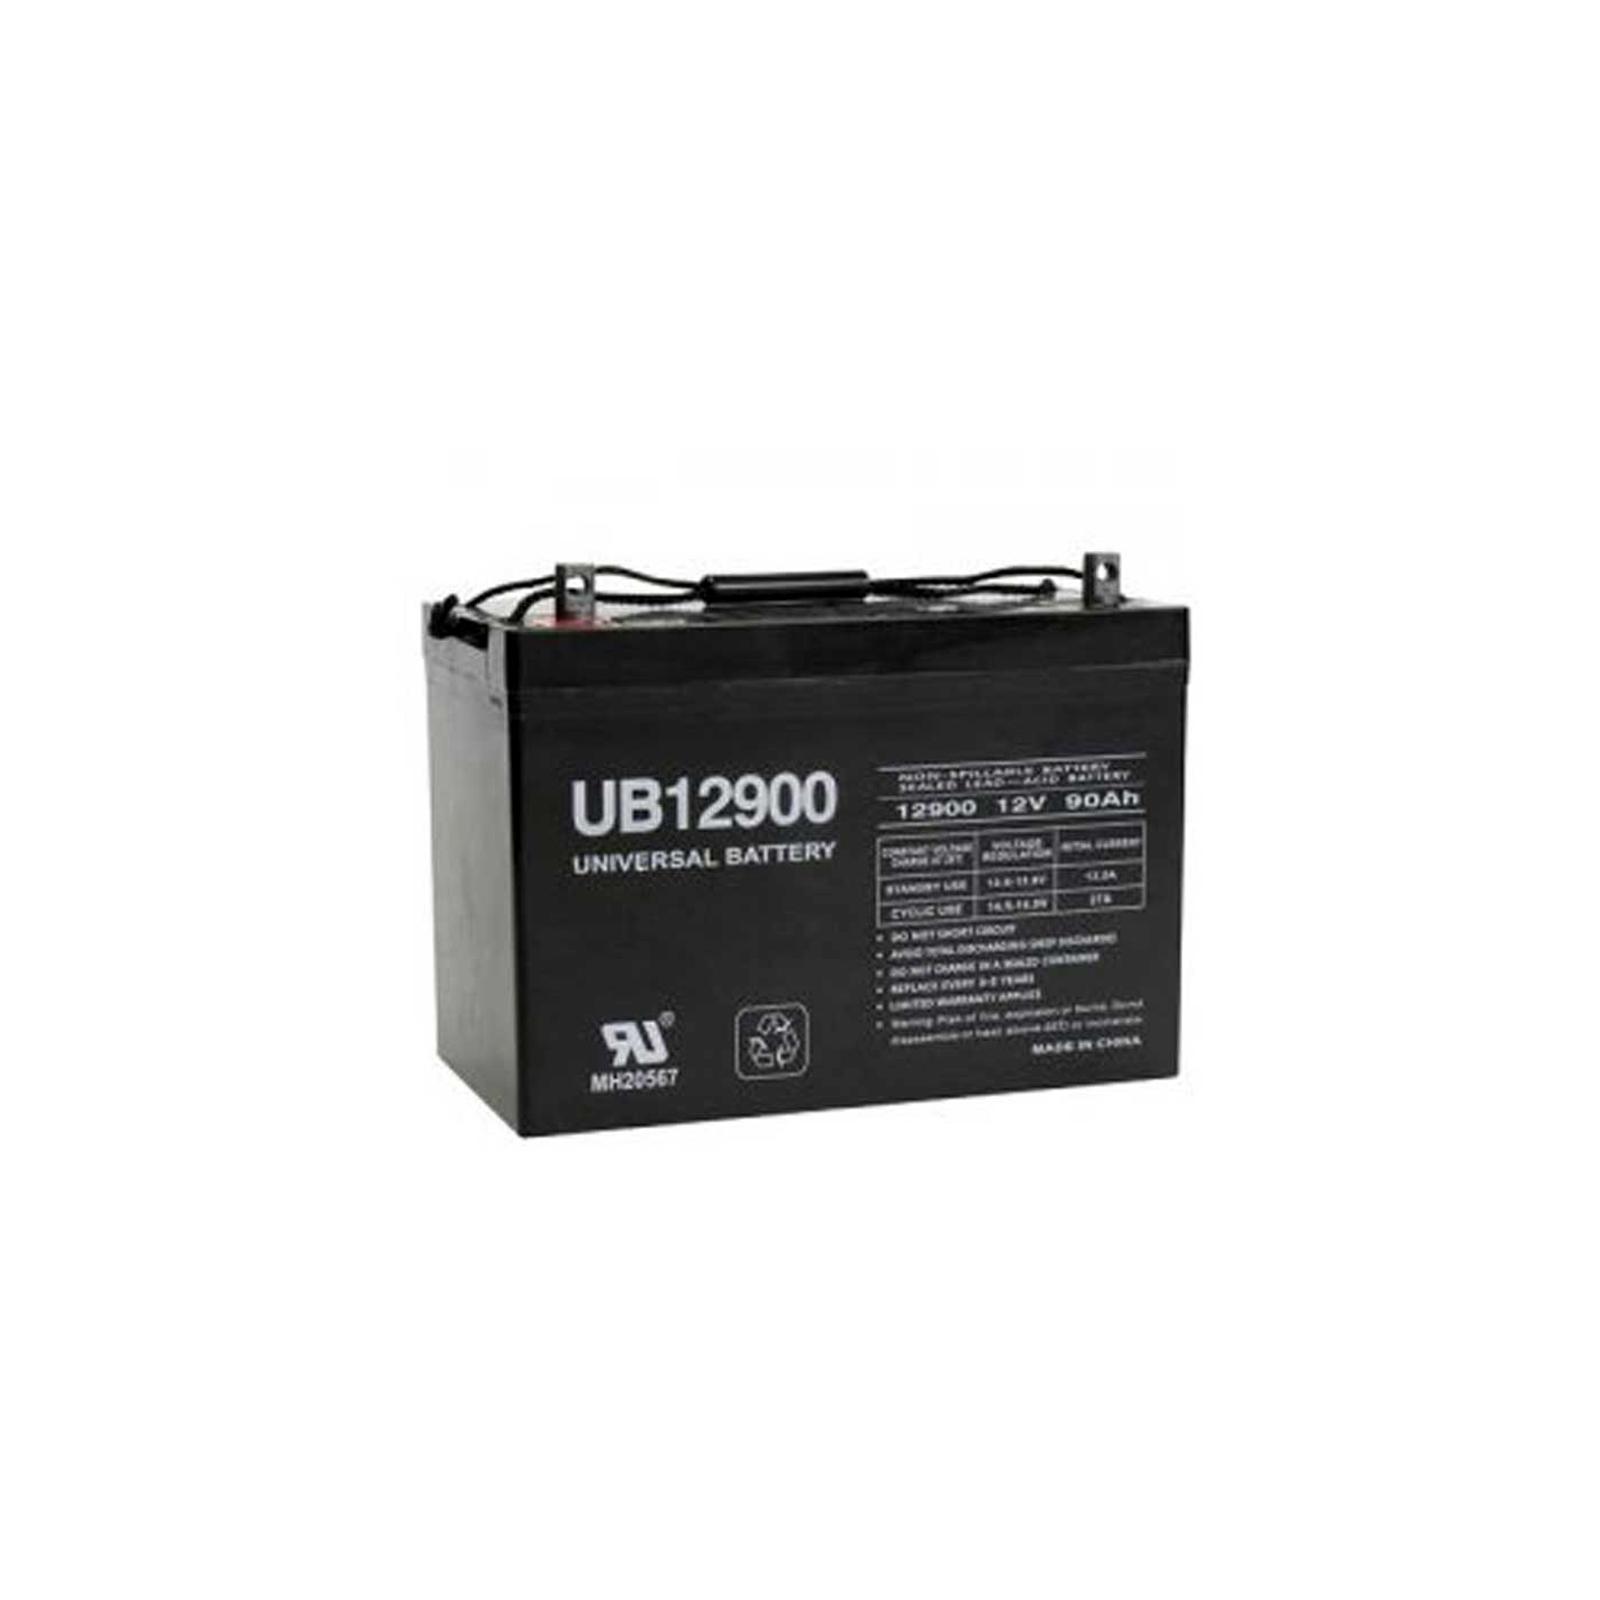 Scooter Batteries  on 12v Mobility Scooter Battery Ub12900 Pride Wrangler   Ebay